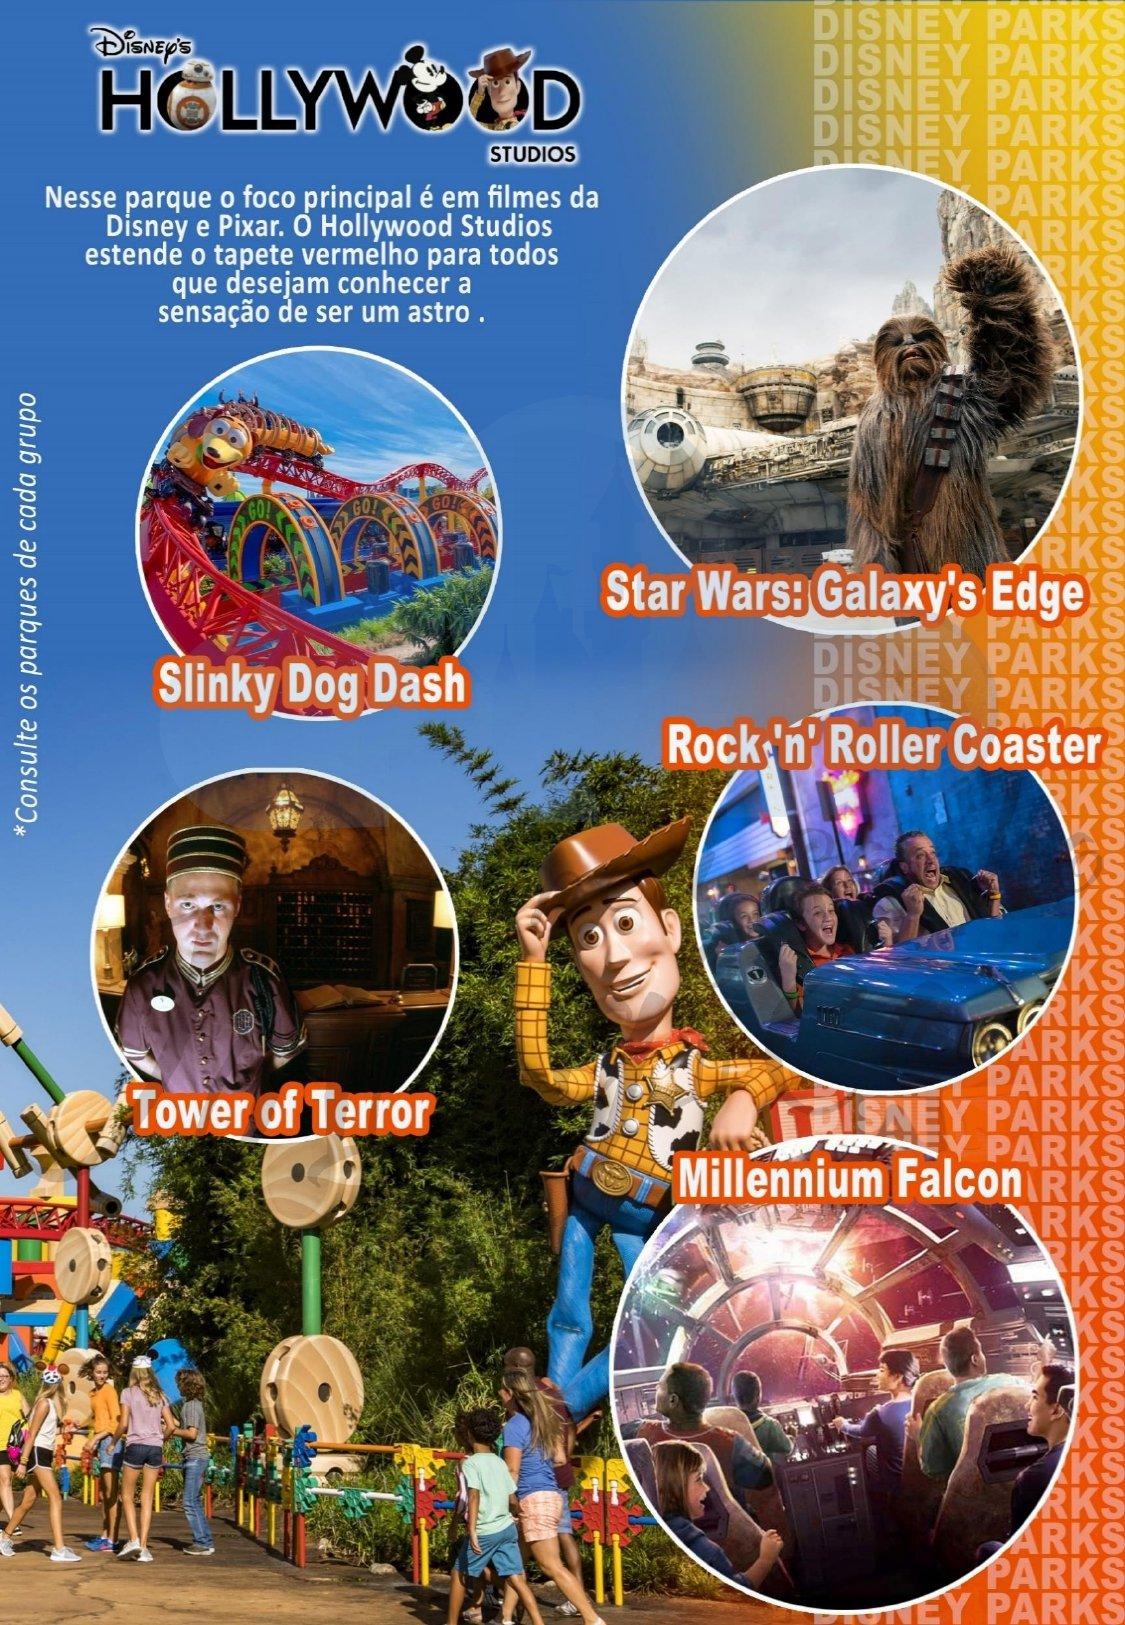 Grupo Teen Inverno - Disney Janeiro 2022 3